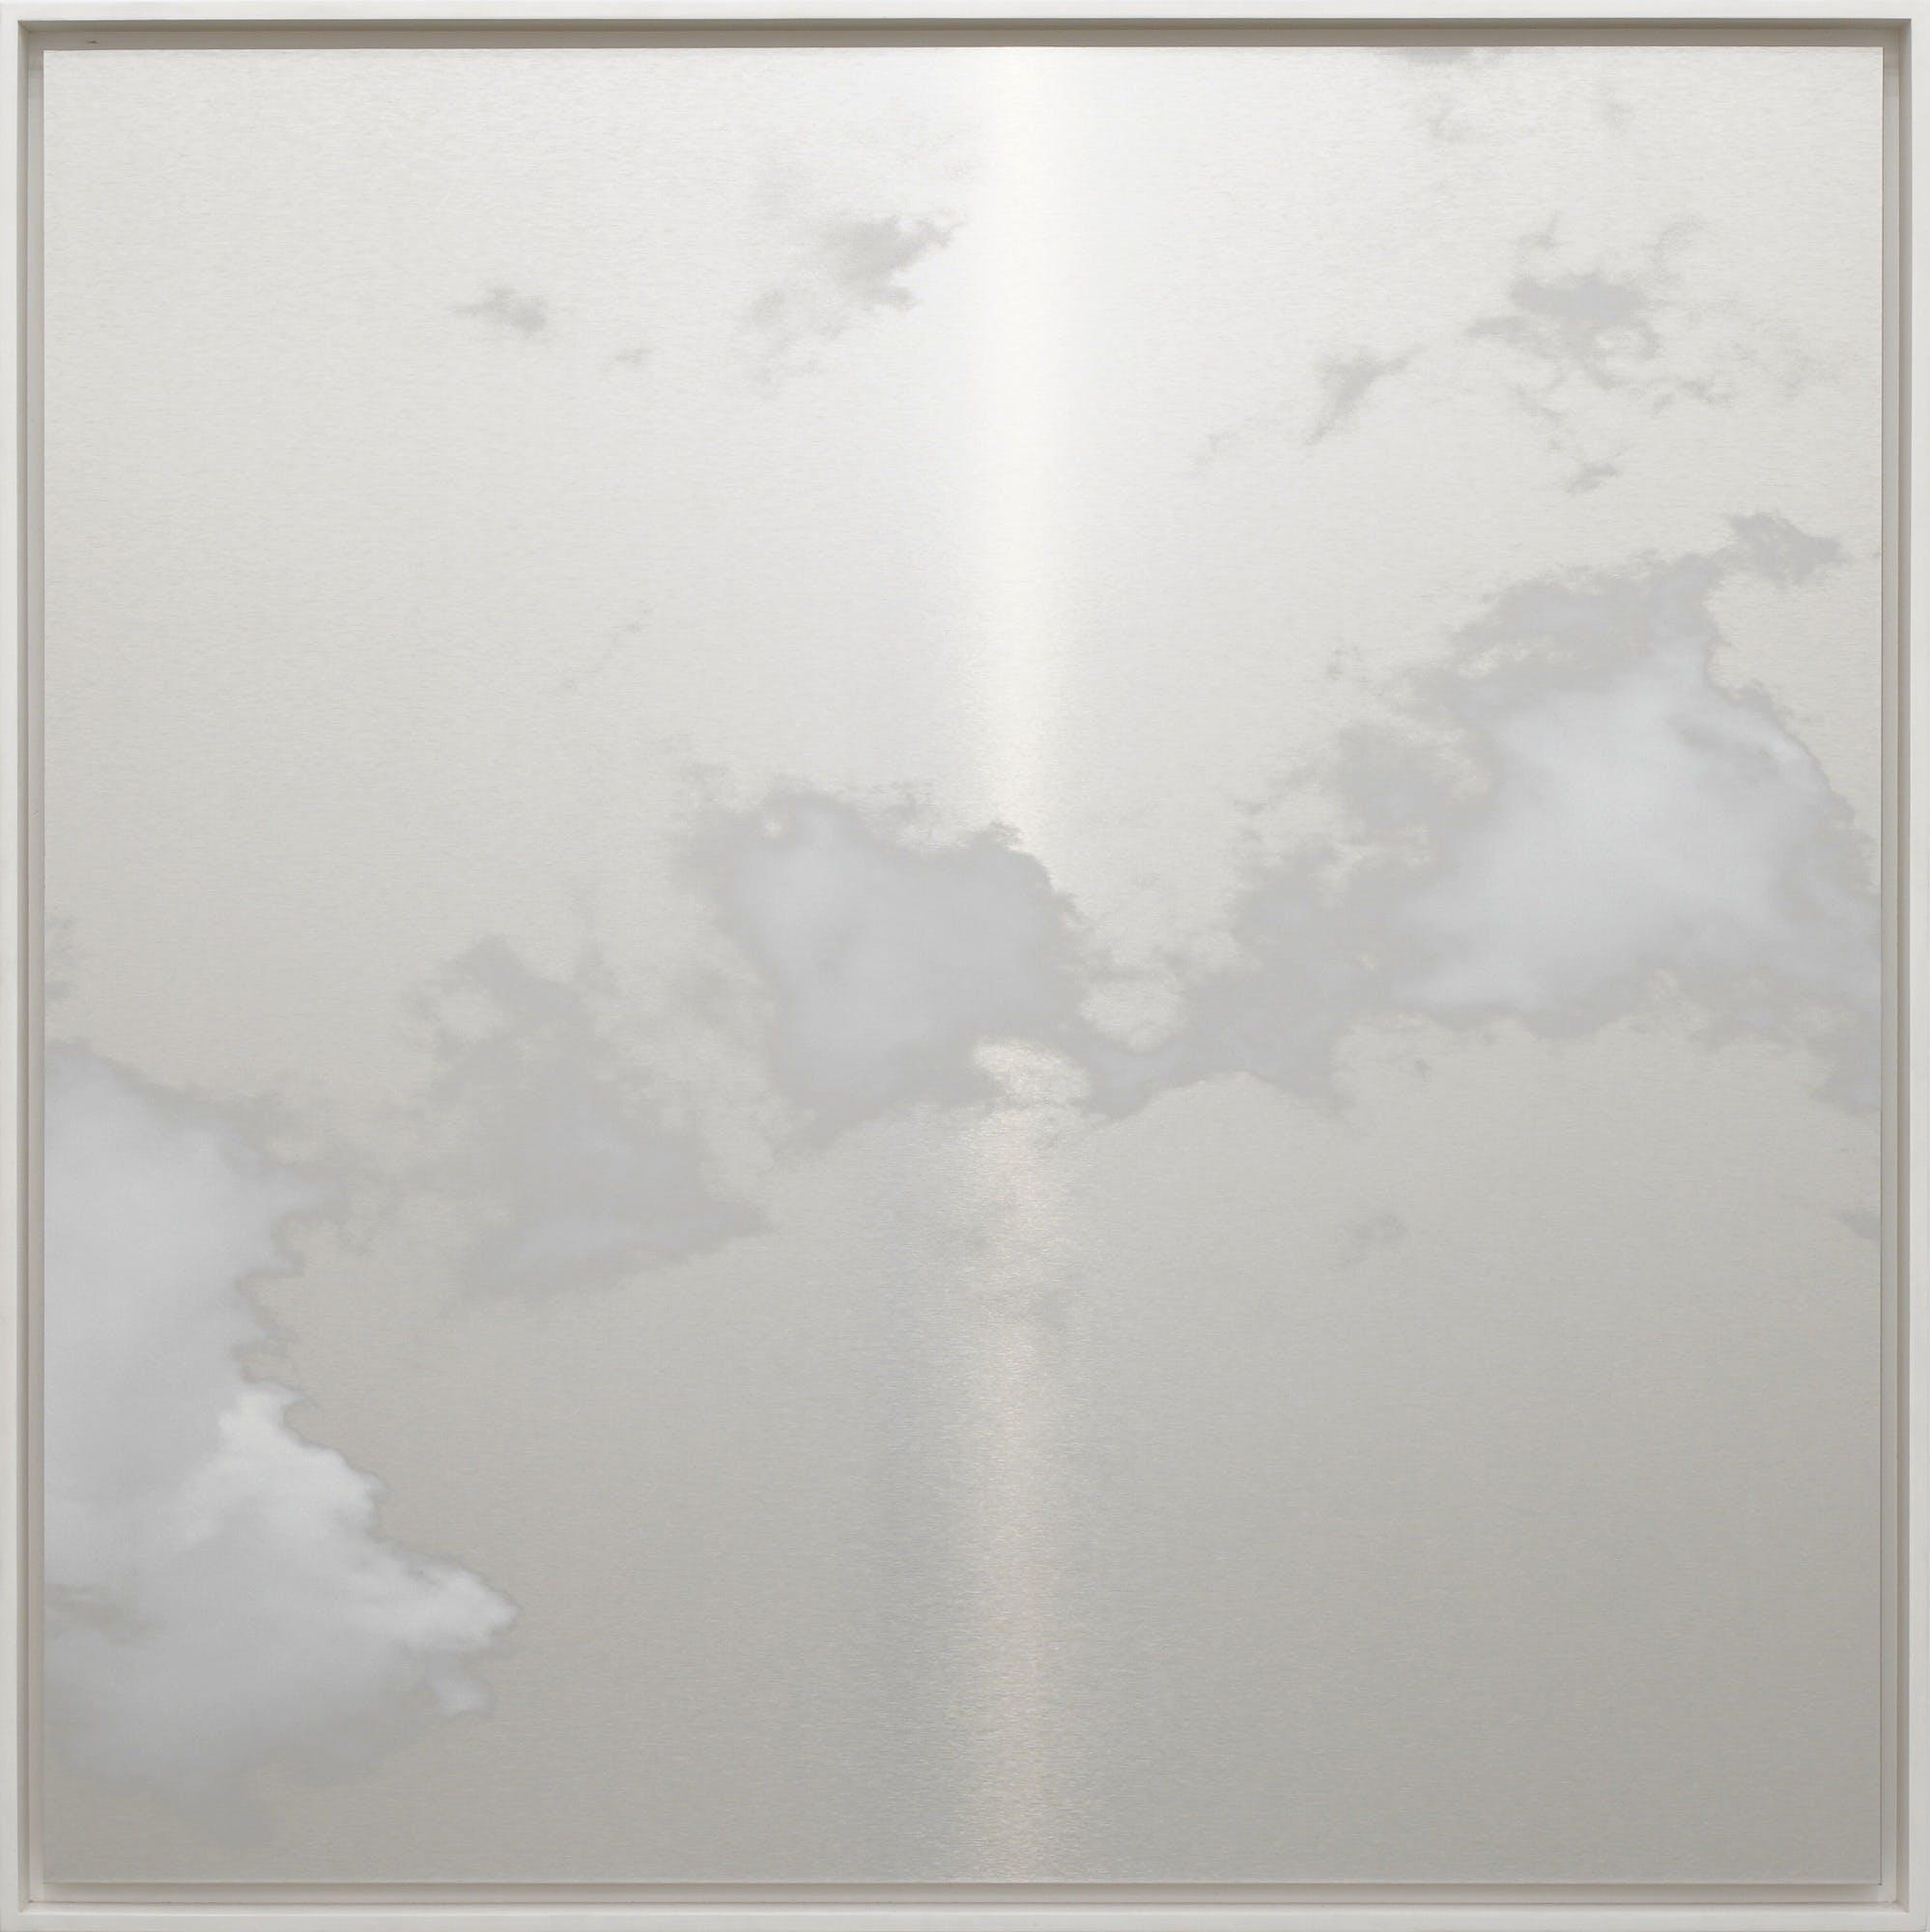 Kumo (Cloud) July 4.4.1